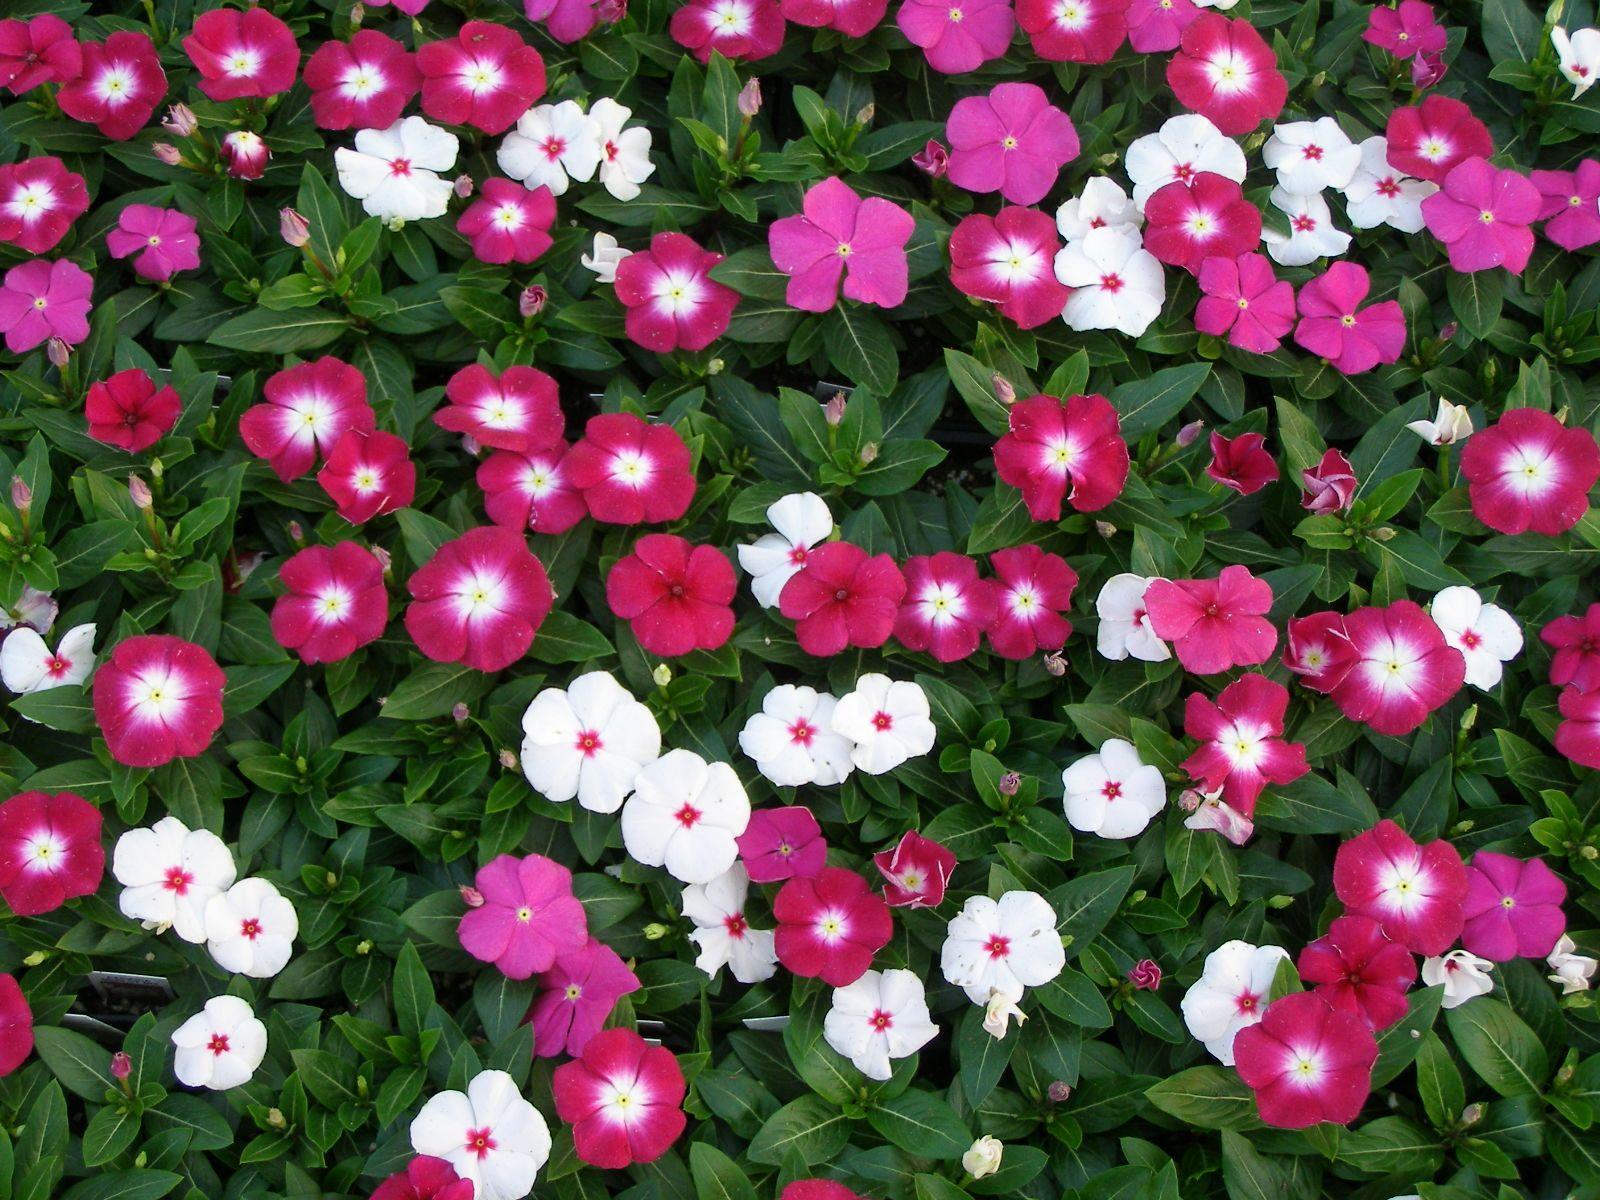 Pacifica Merlot Mix Vinca Periwinkle Flowers Annual Flowers Flower Seeds